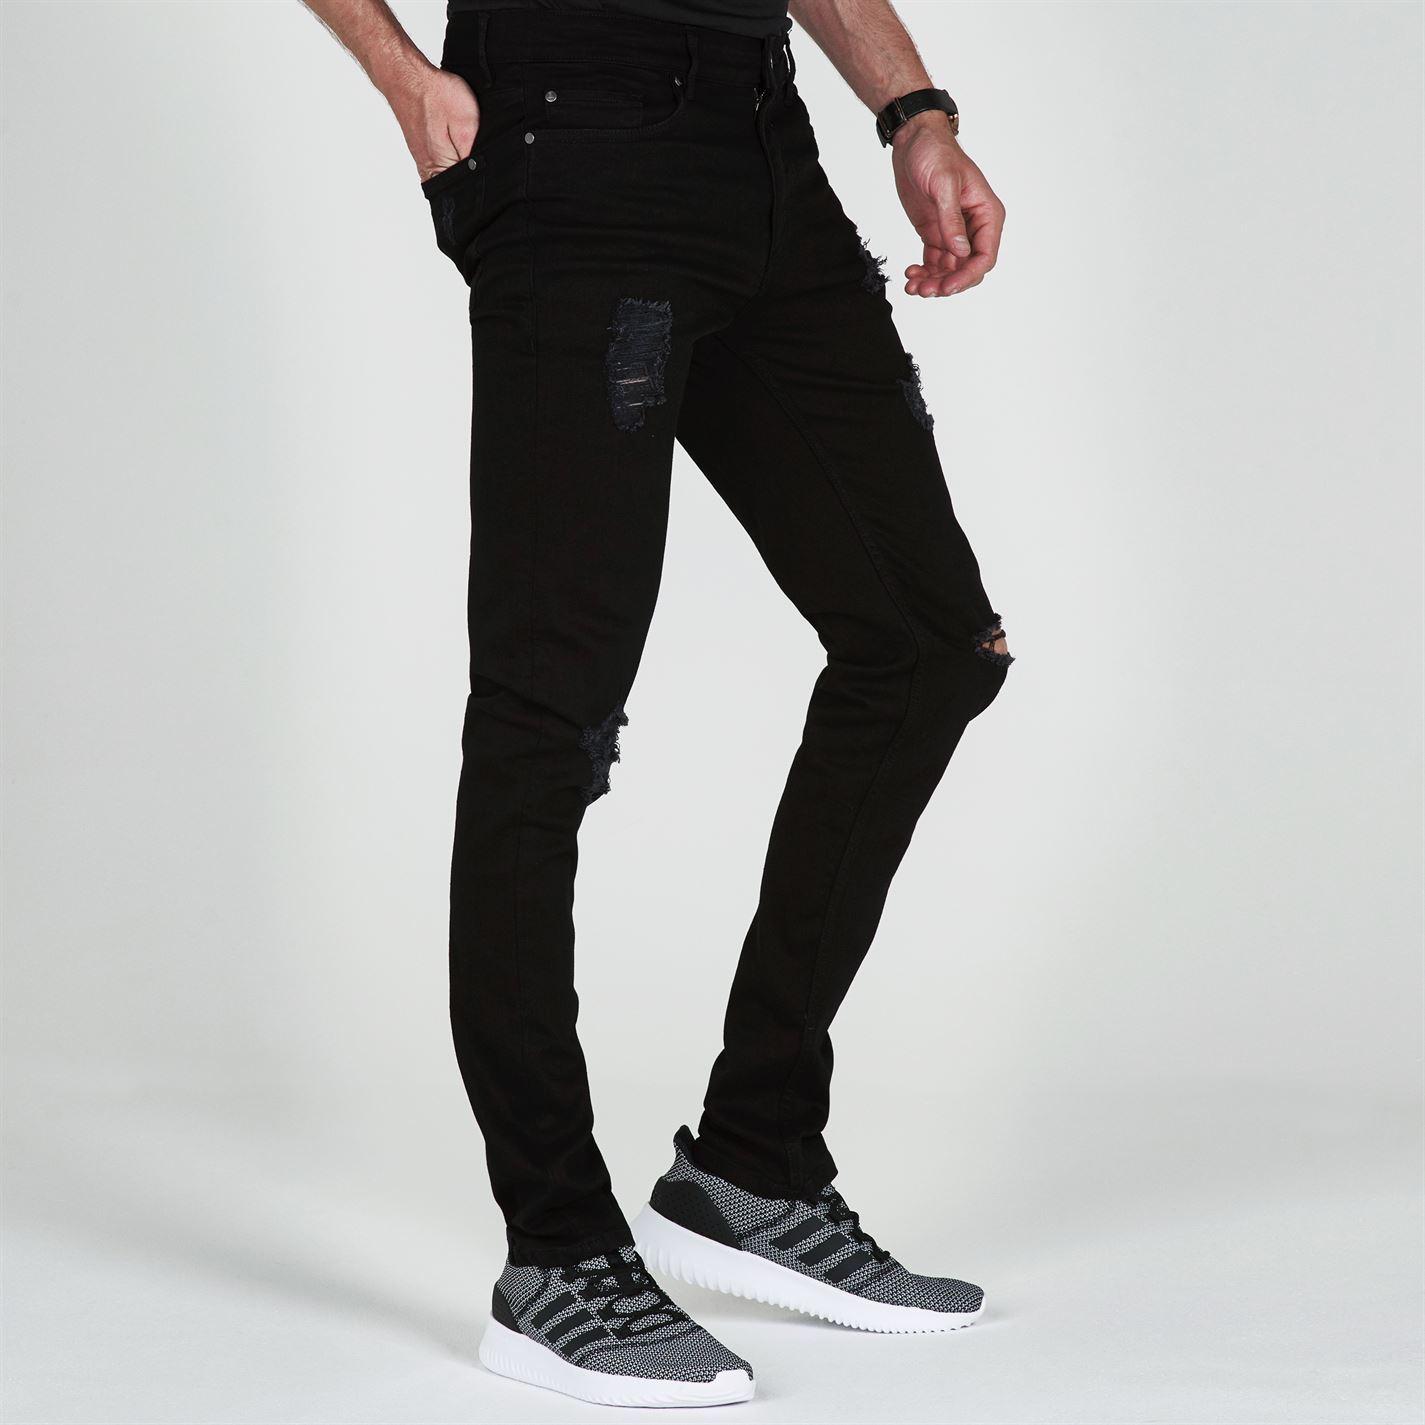 Jeans-Denim-Firetrap-Skinny-Mens-Trouser-Pants-Black thumbnail 13